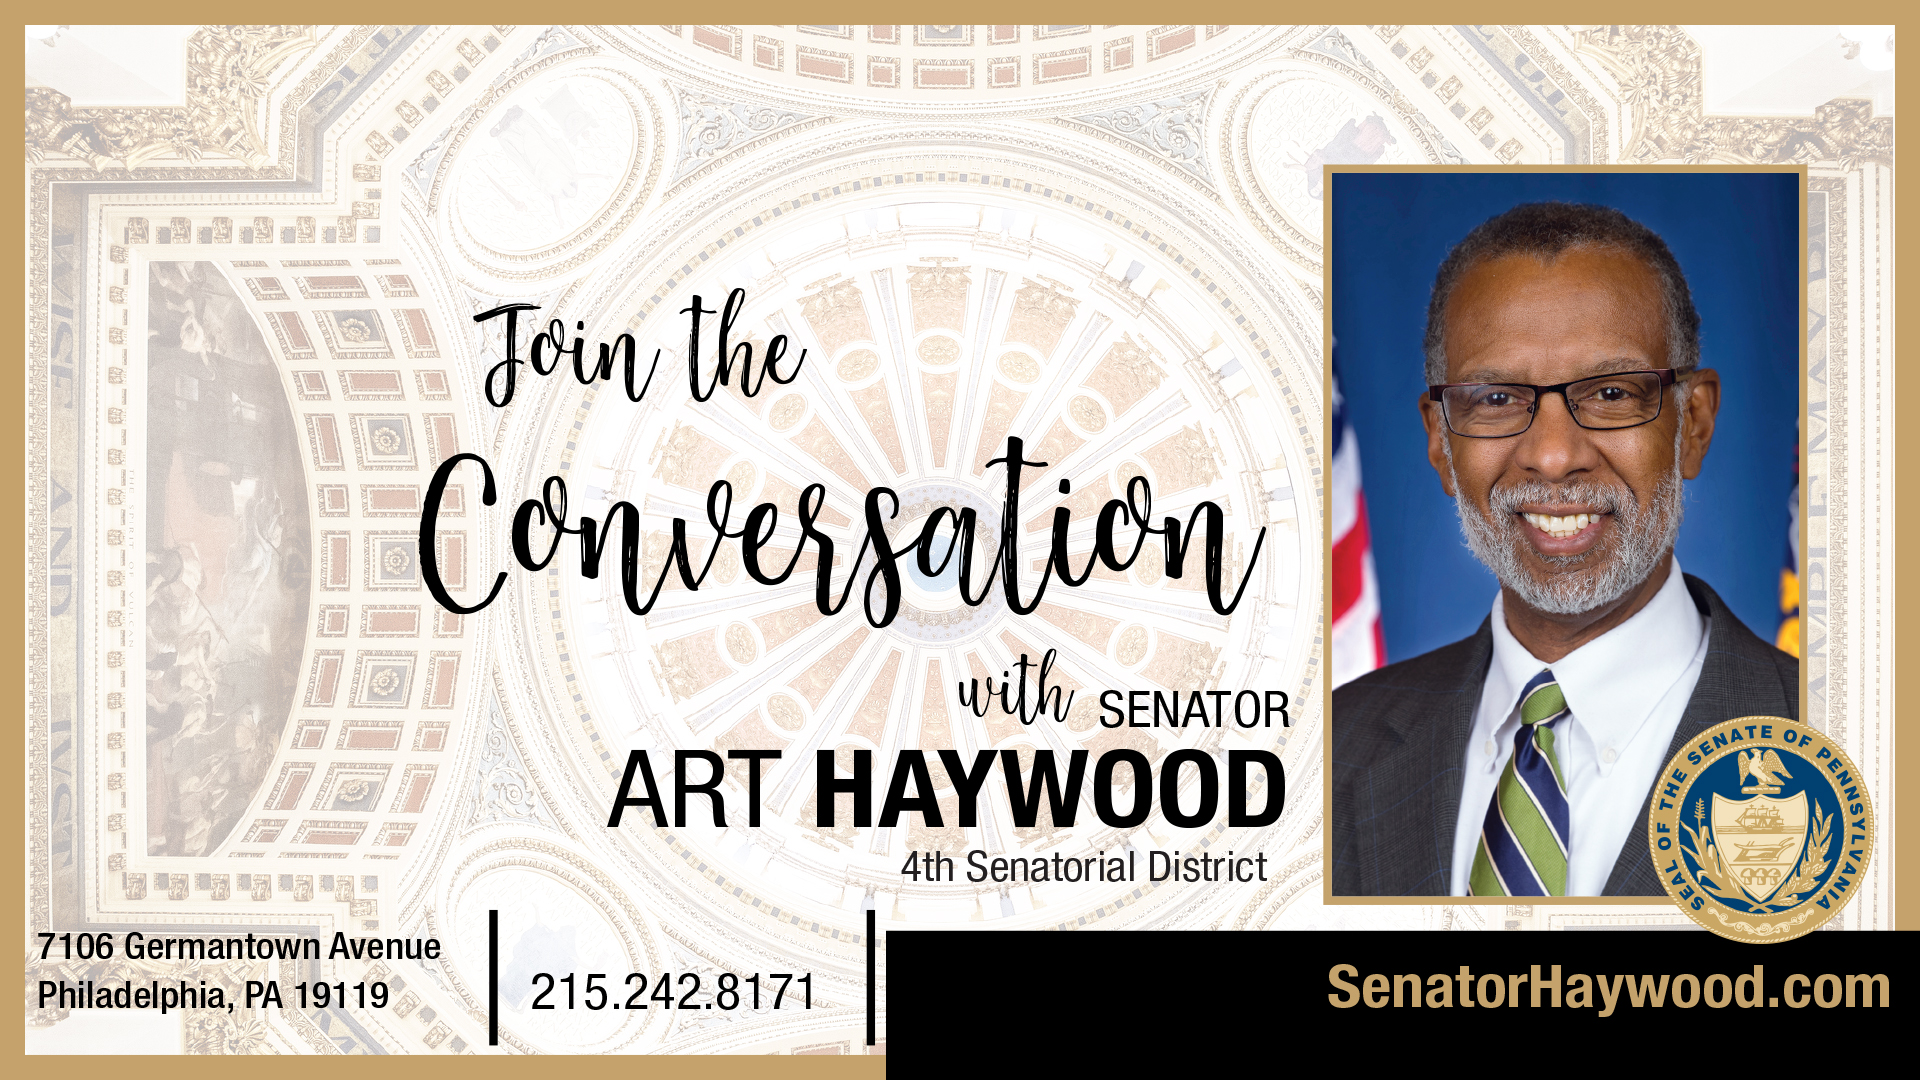 PA State Senator Art Haywood